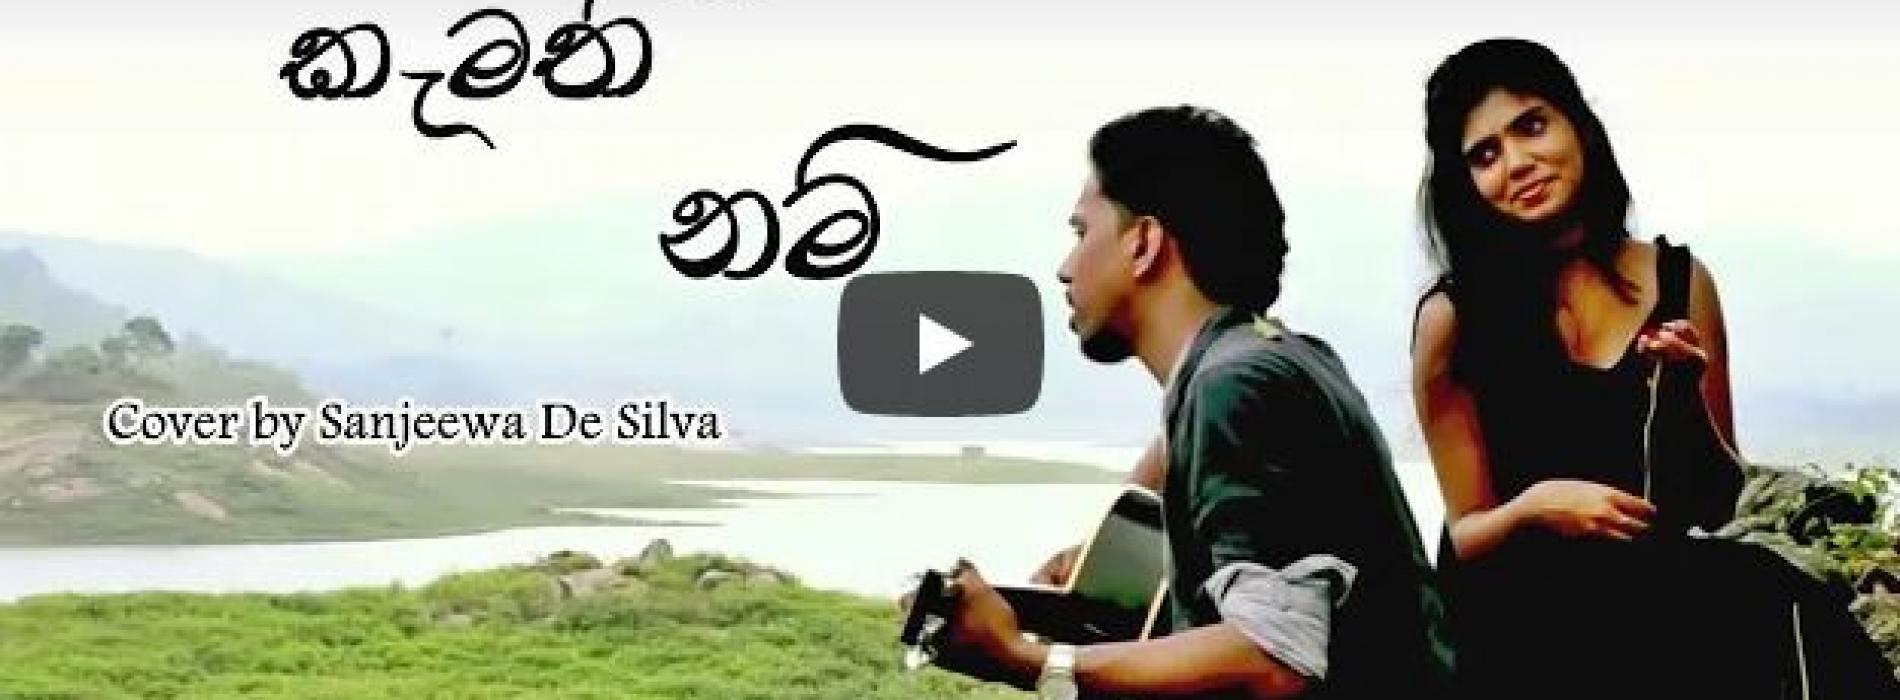 New Music : ඔබ කැමති නම් (Oba Kamathi Nam) | Gypsies cover by Sanjeewa De Silva